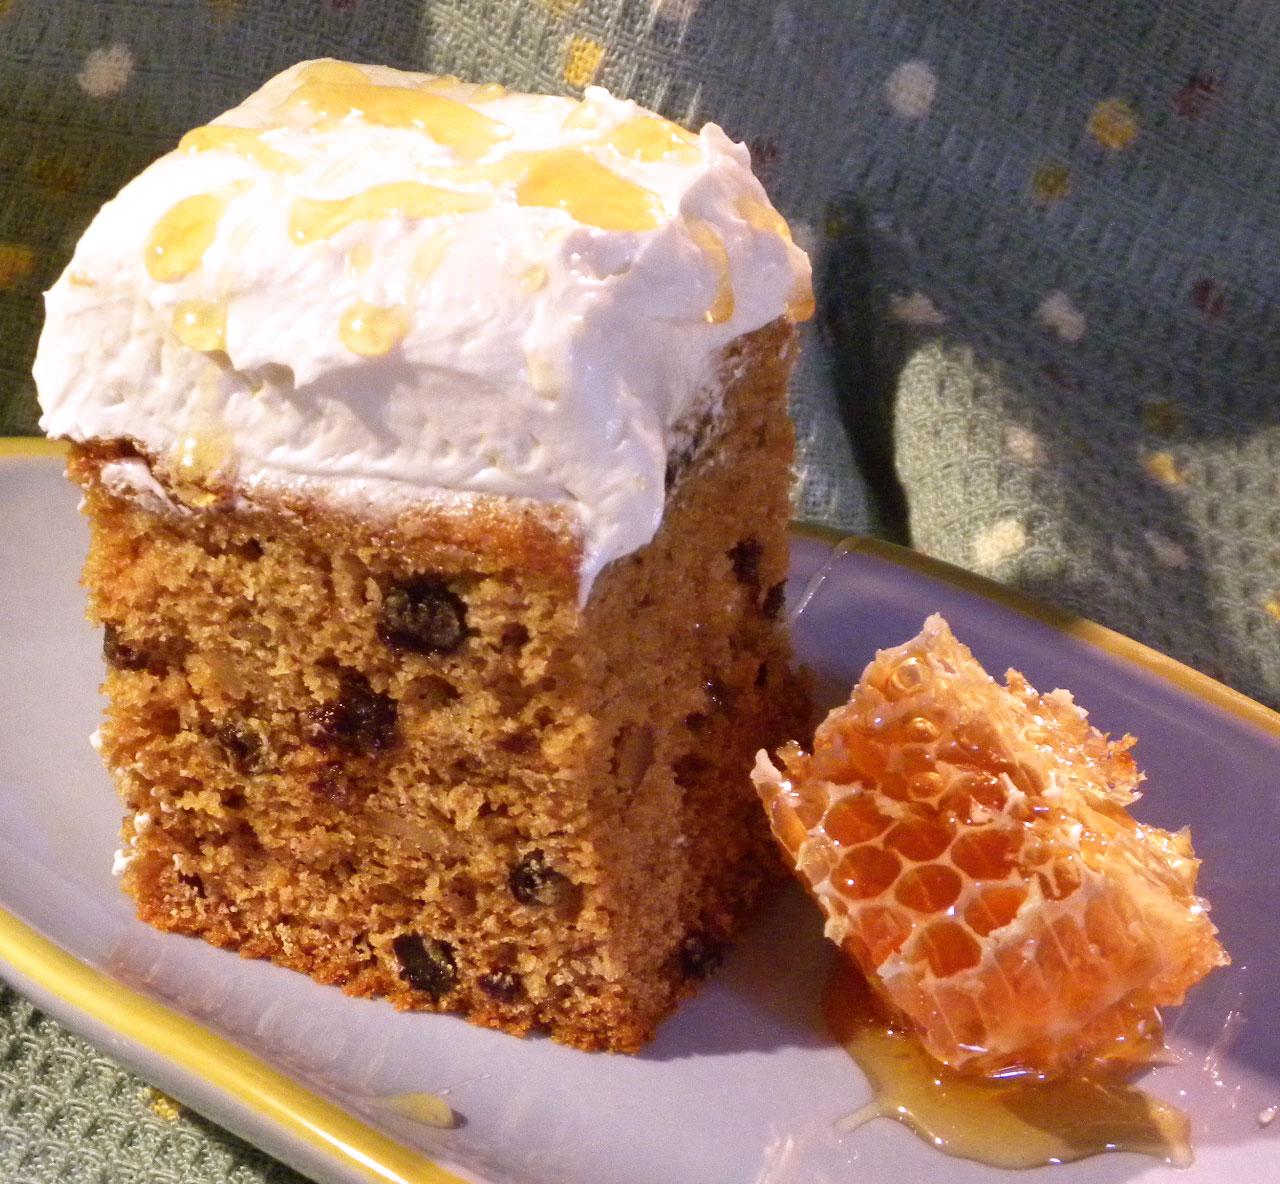 Bubie's Little Baker: Honey Cake For a Sweet New Year